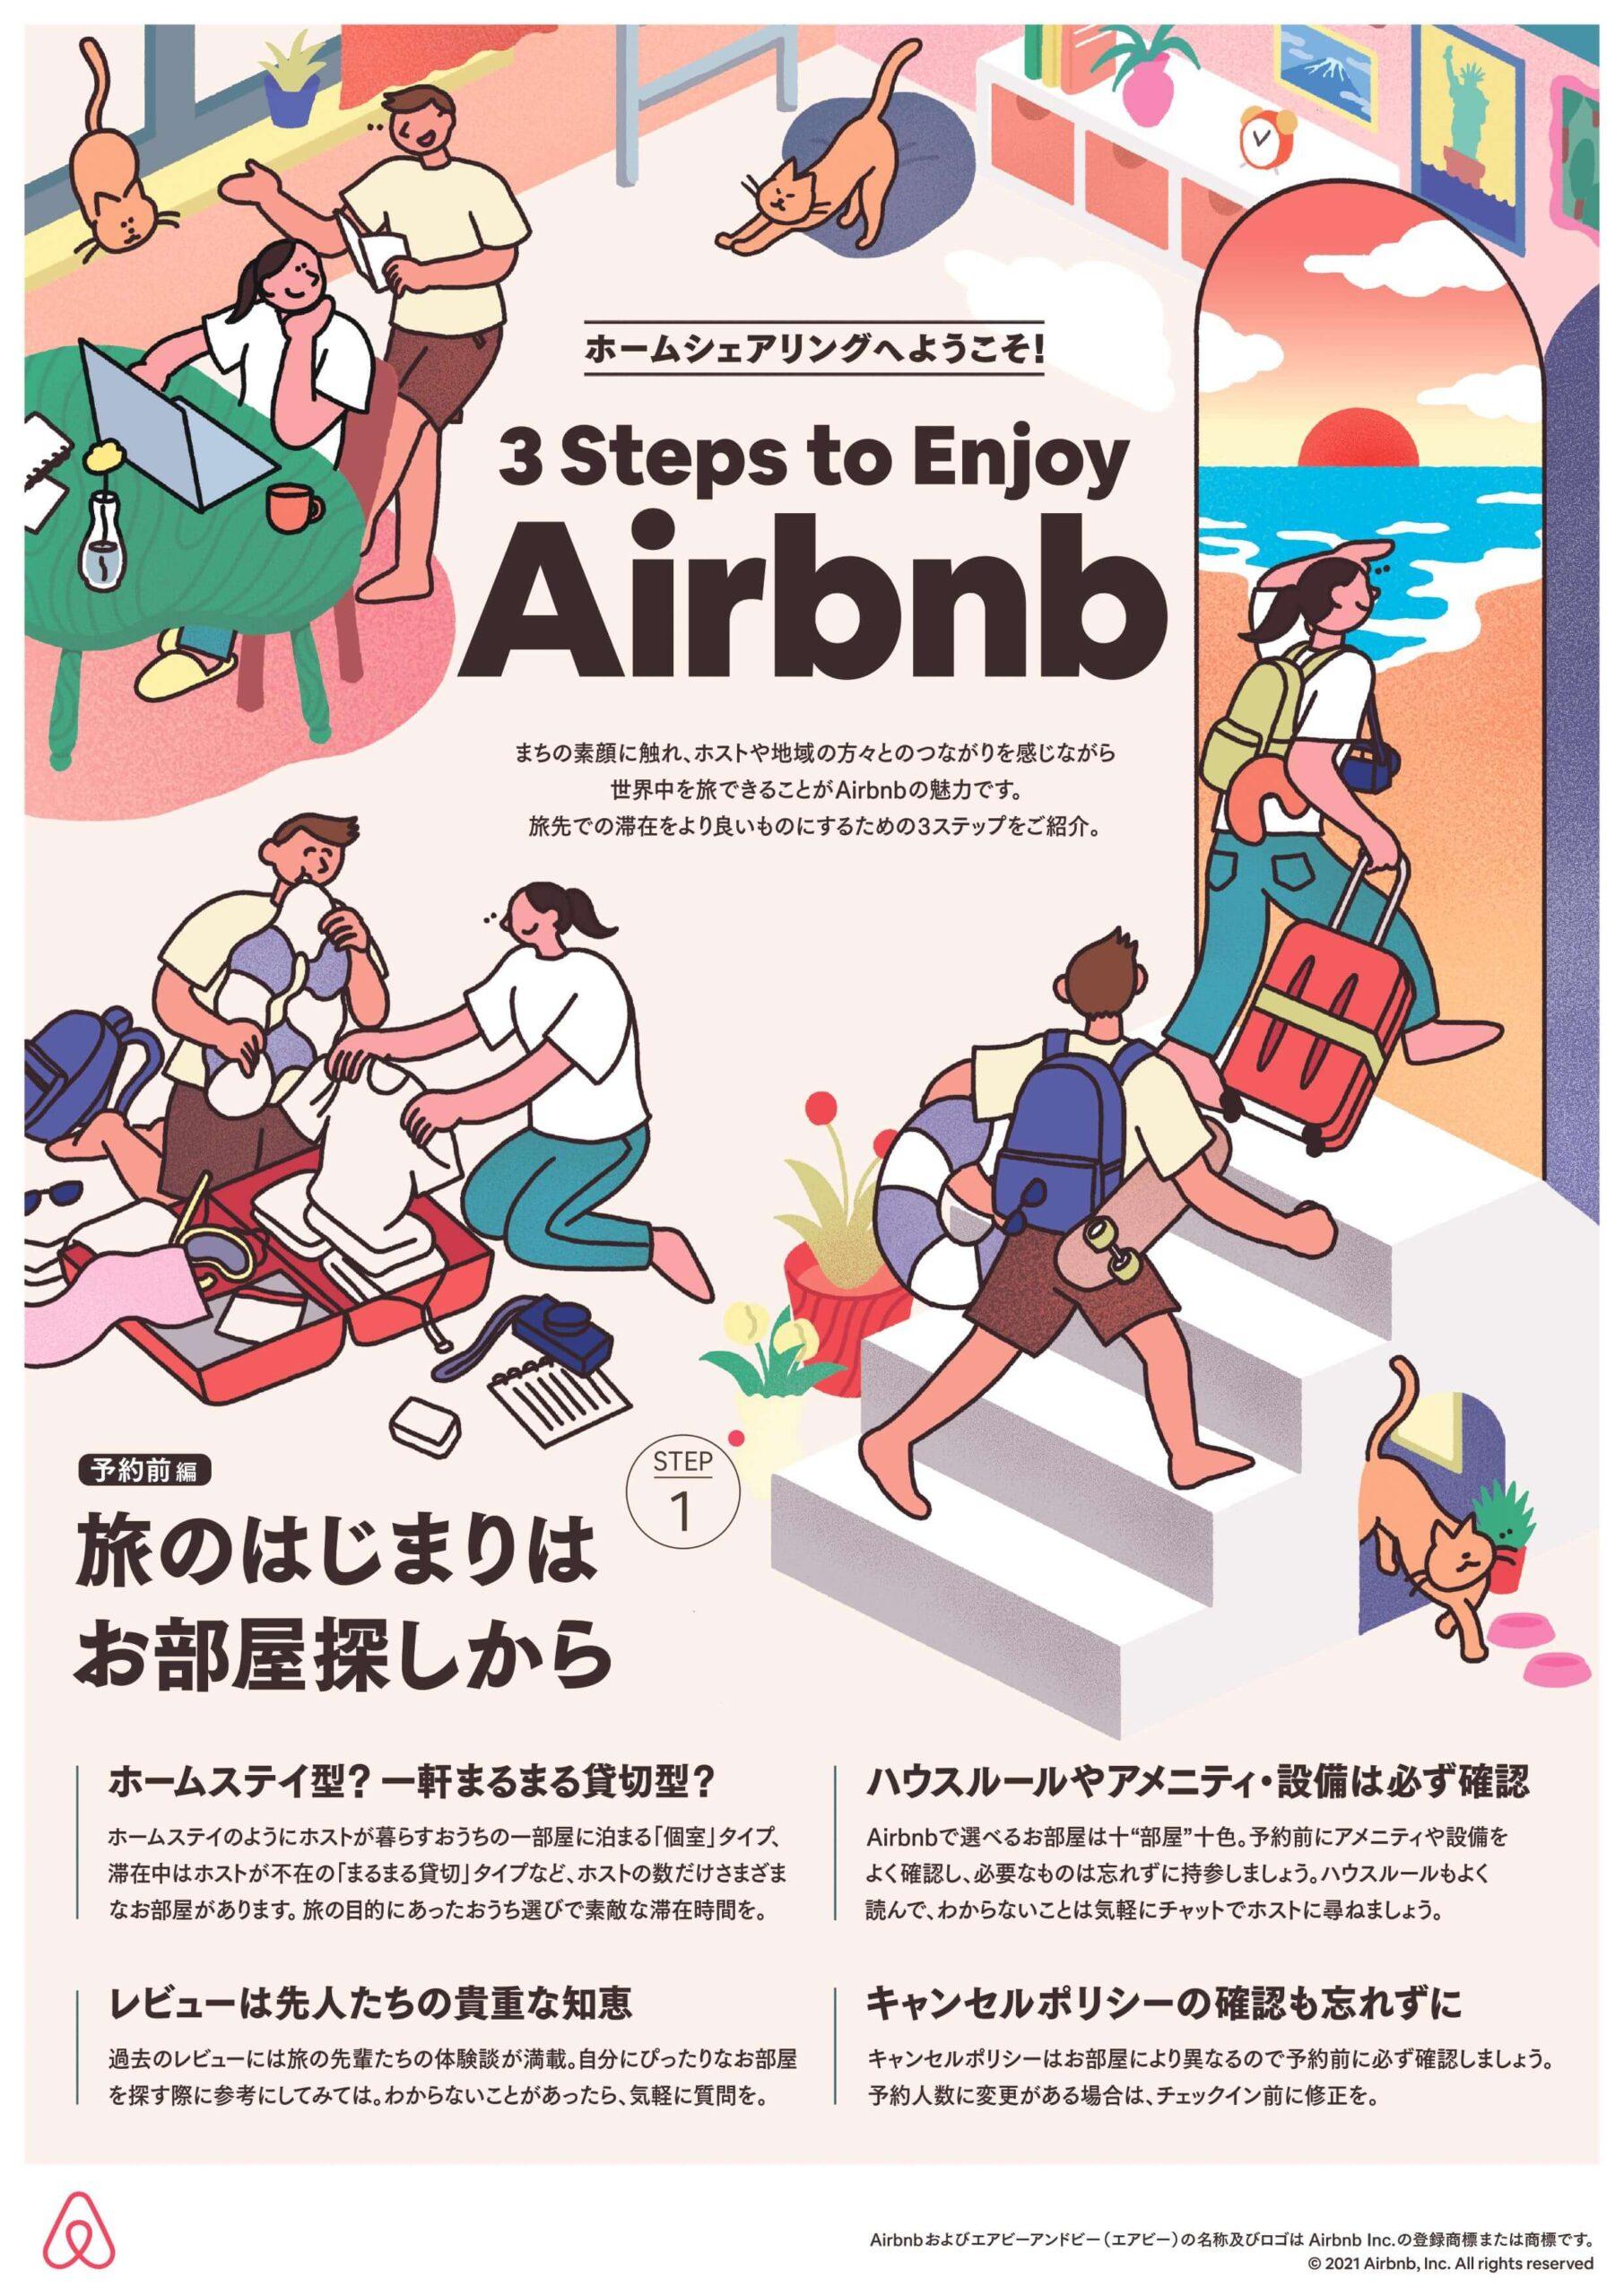 https://www.airbnb.jp/d/goodguest